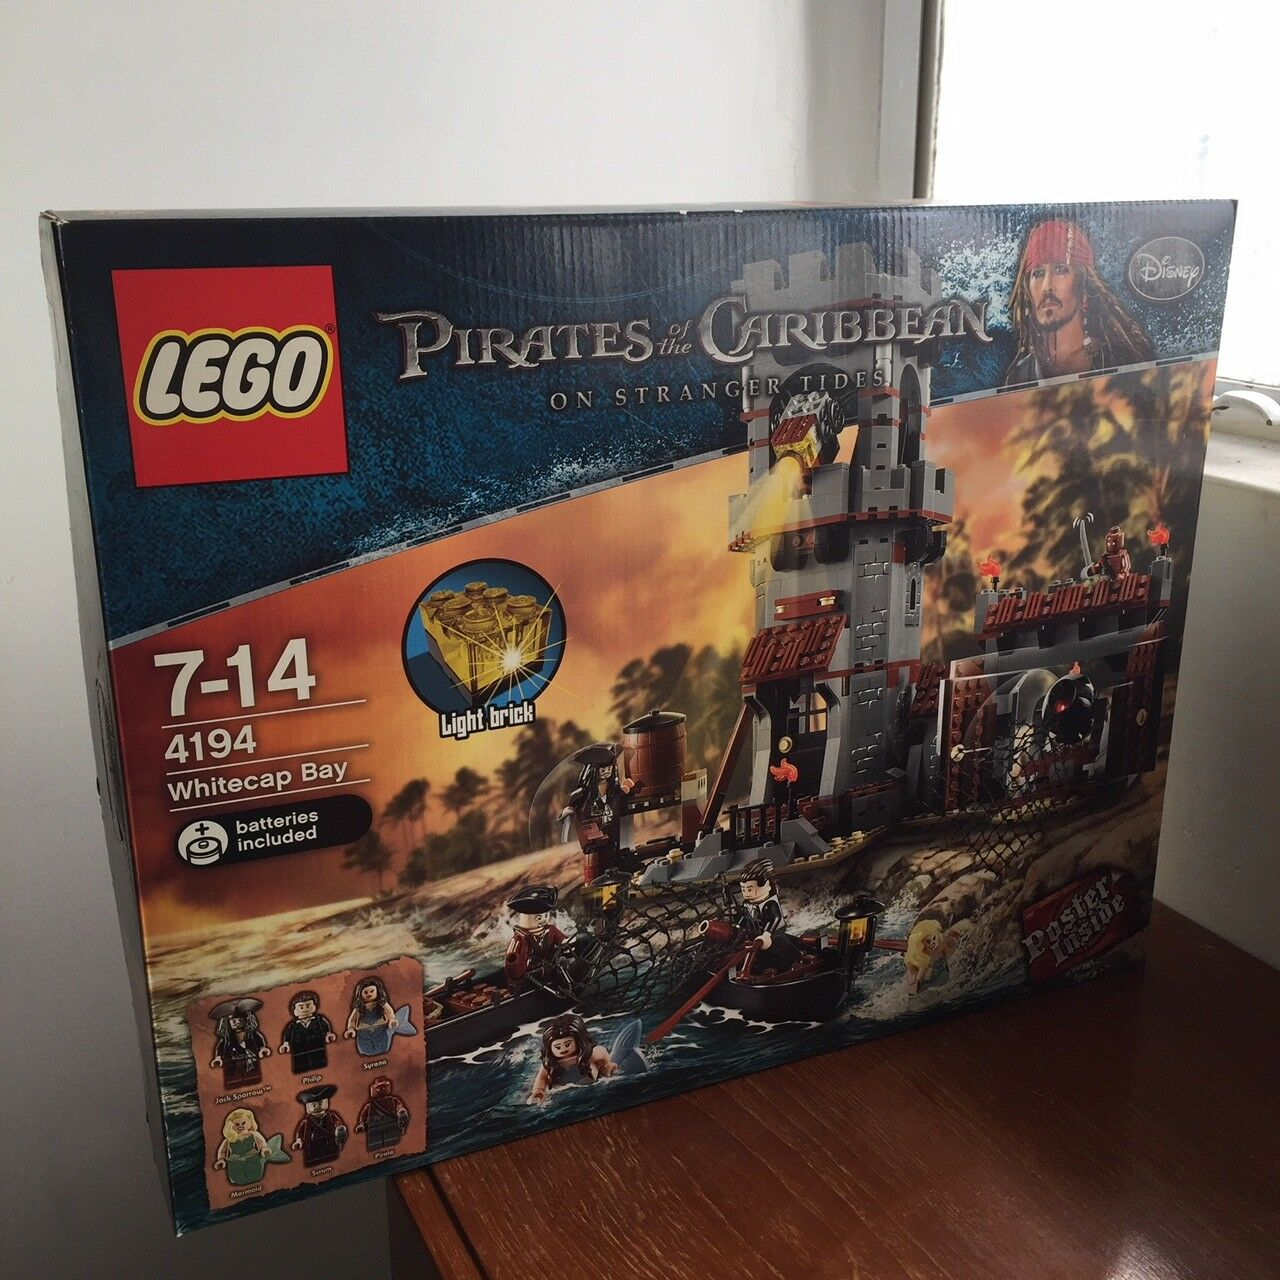 NEW Lego Pirates of the Caribbean 4194 Whitecap Bay SEALED 2011